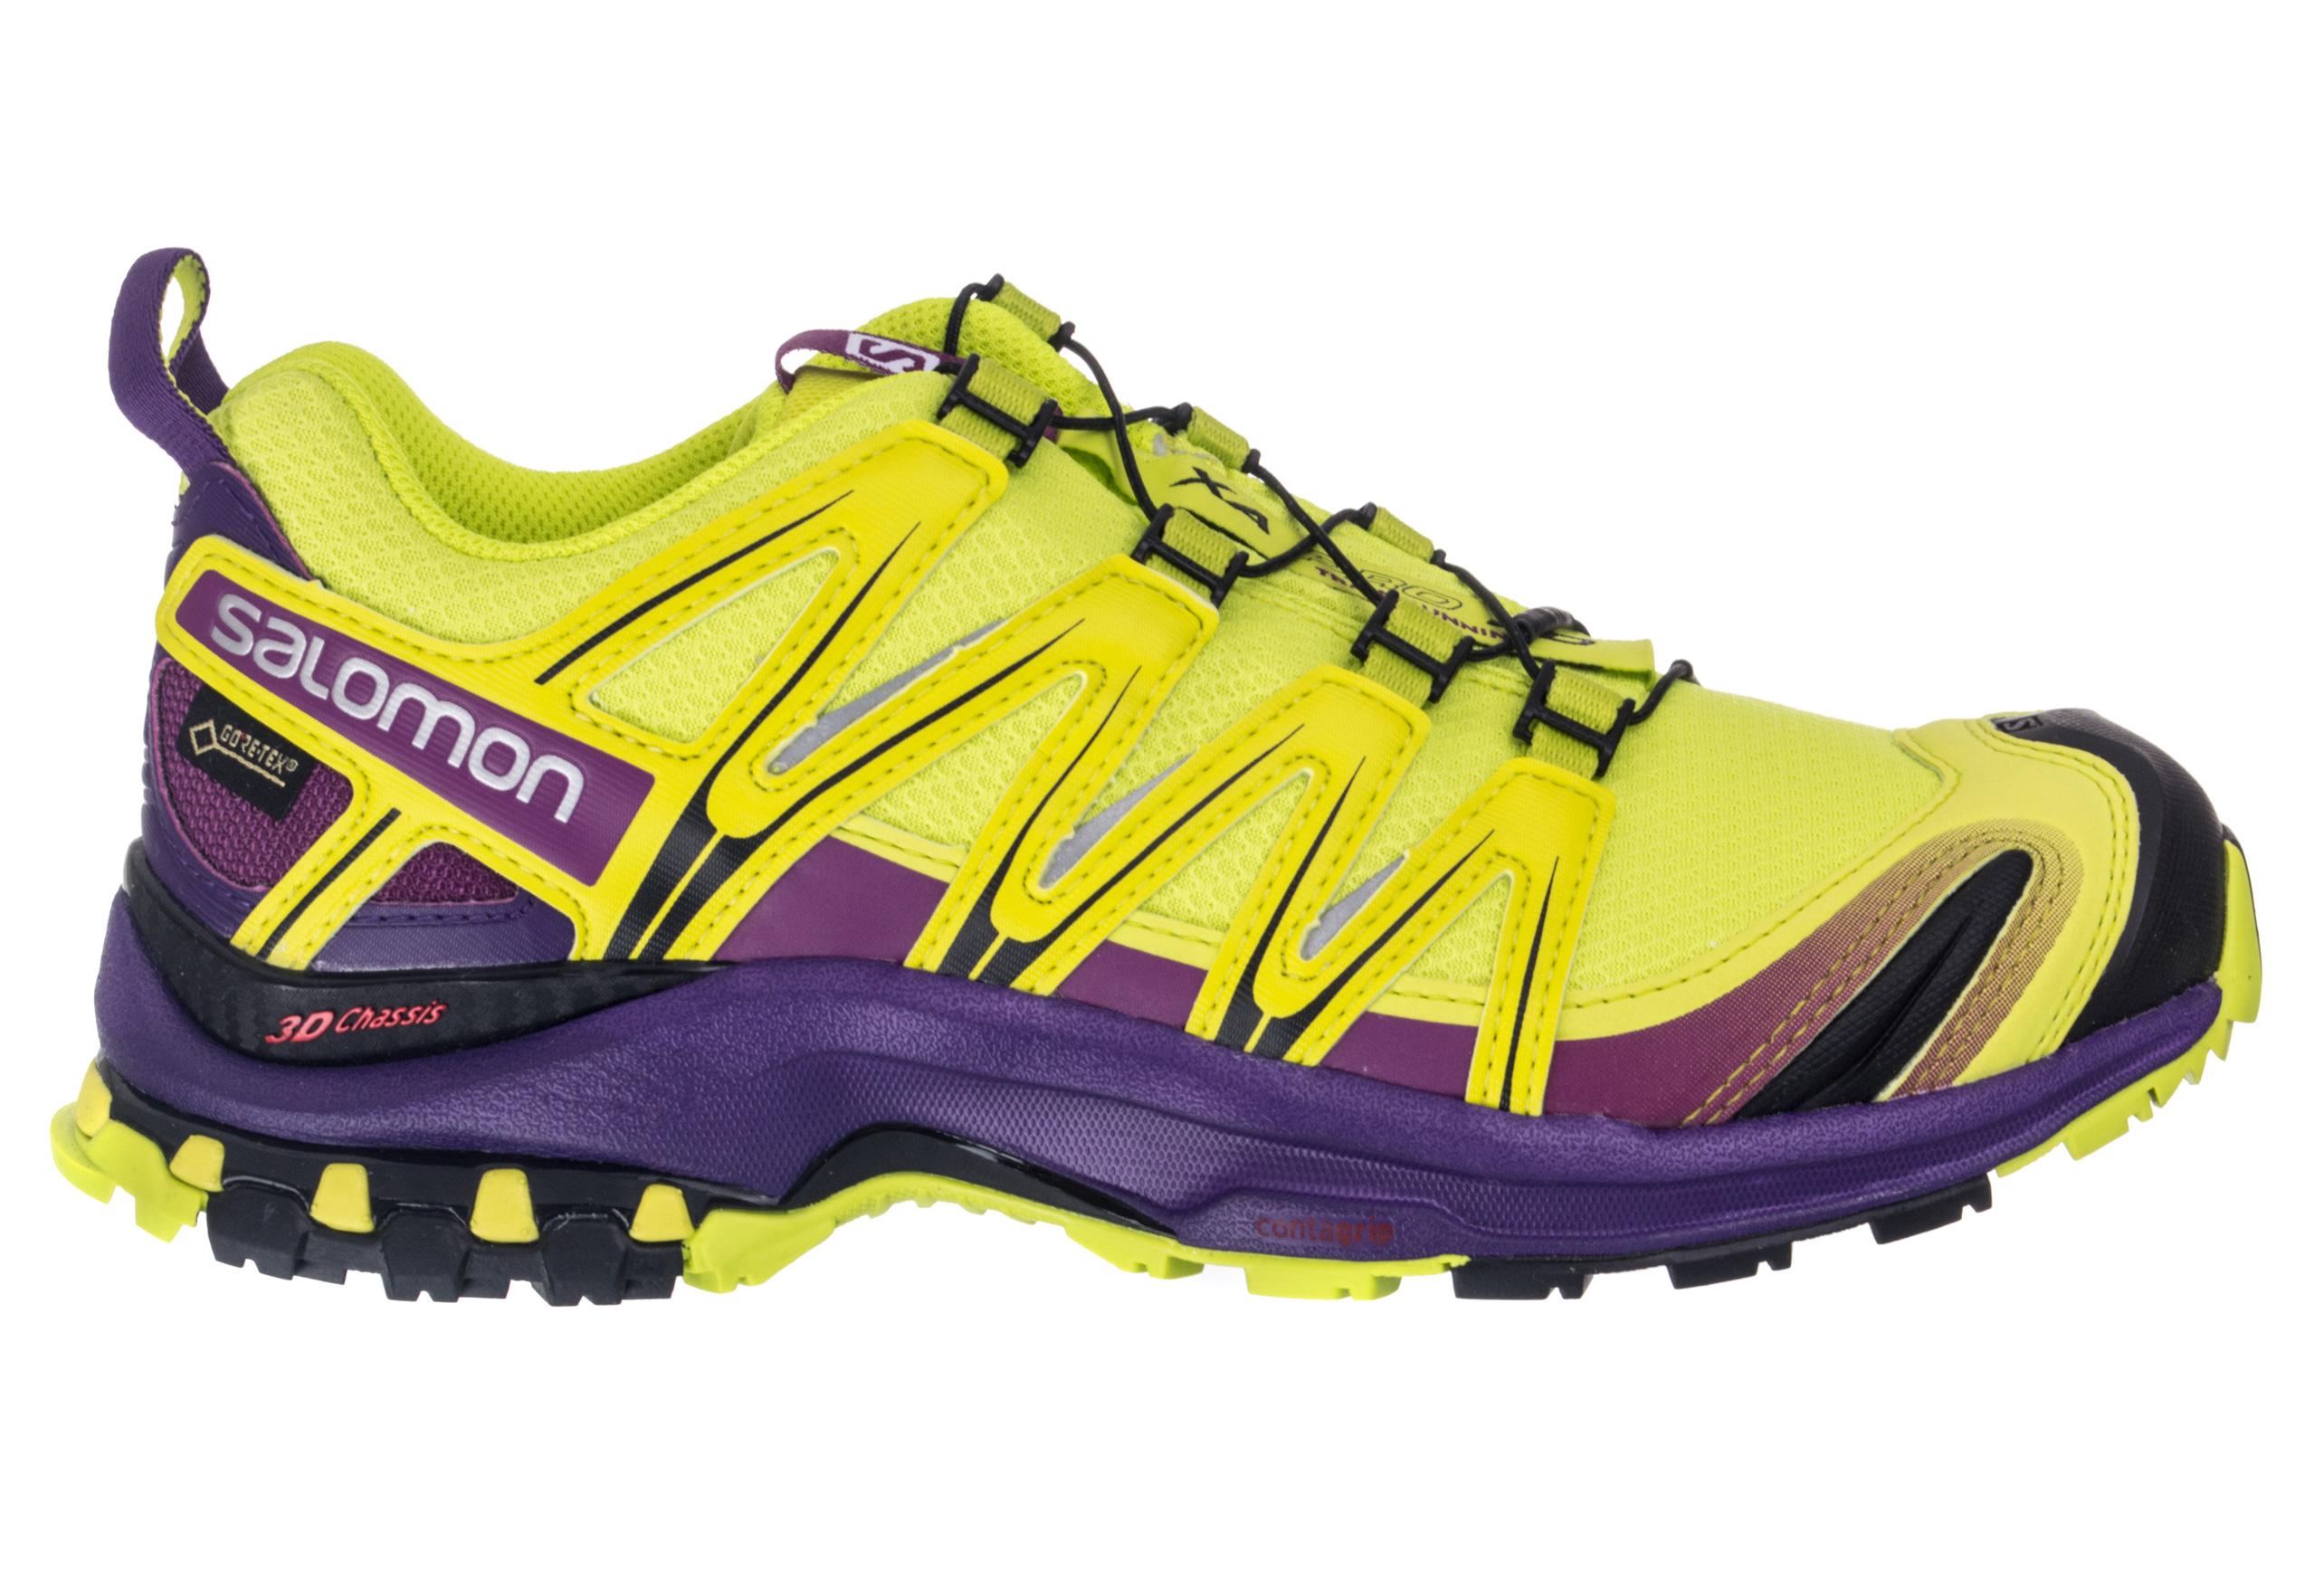 salomon shoes xa pro 3d gtx women yellow purple. Black Bedroom Furniture Sets. Home Design Ideas